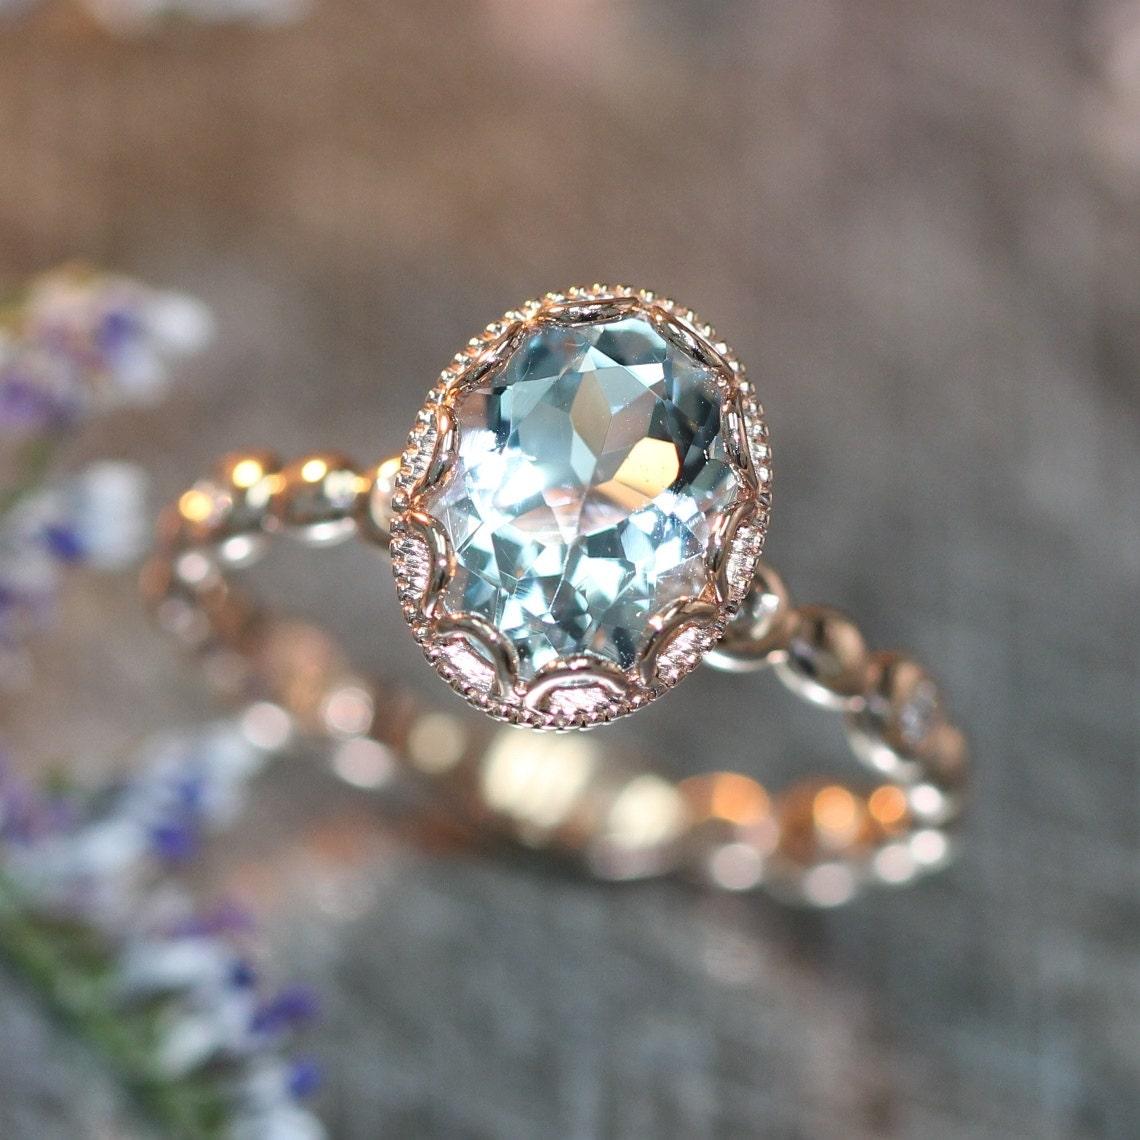 Wedding Rings Flowers: Floral Aquamarine Engagement Ring In 14k Rose Gold Pebble